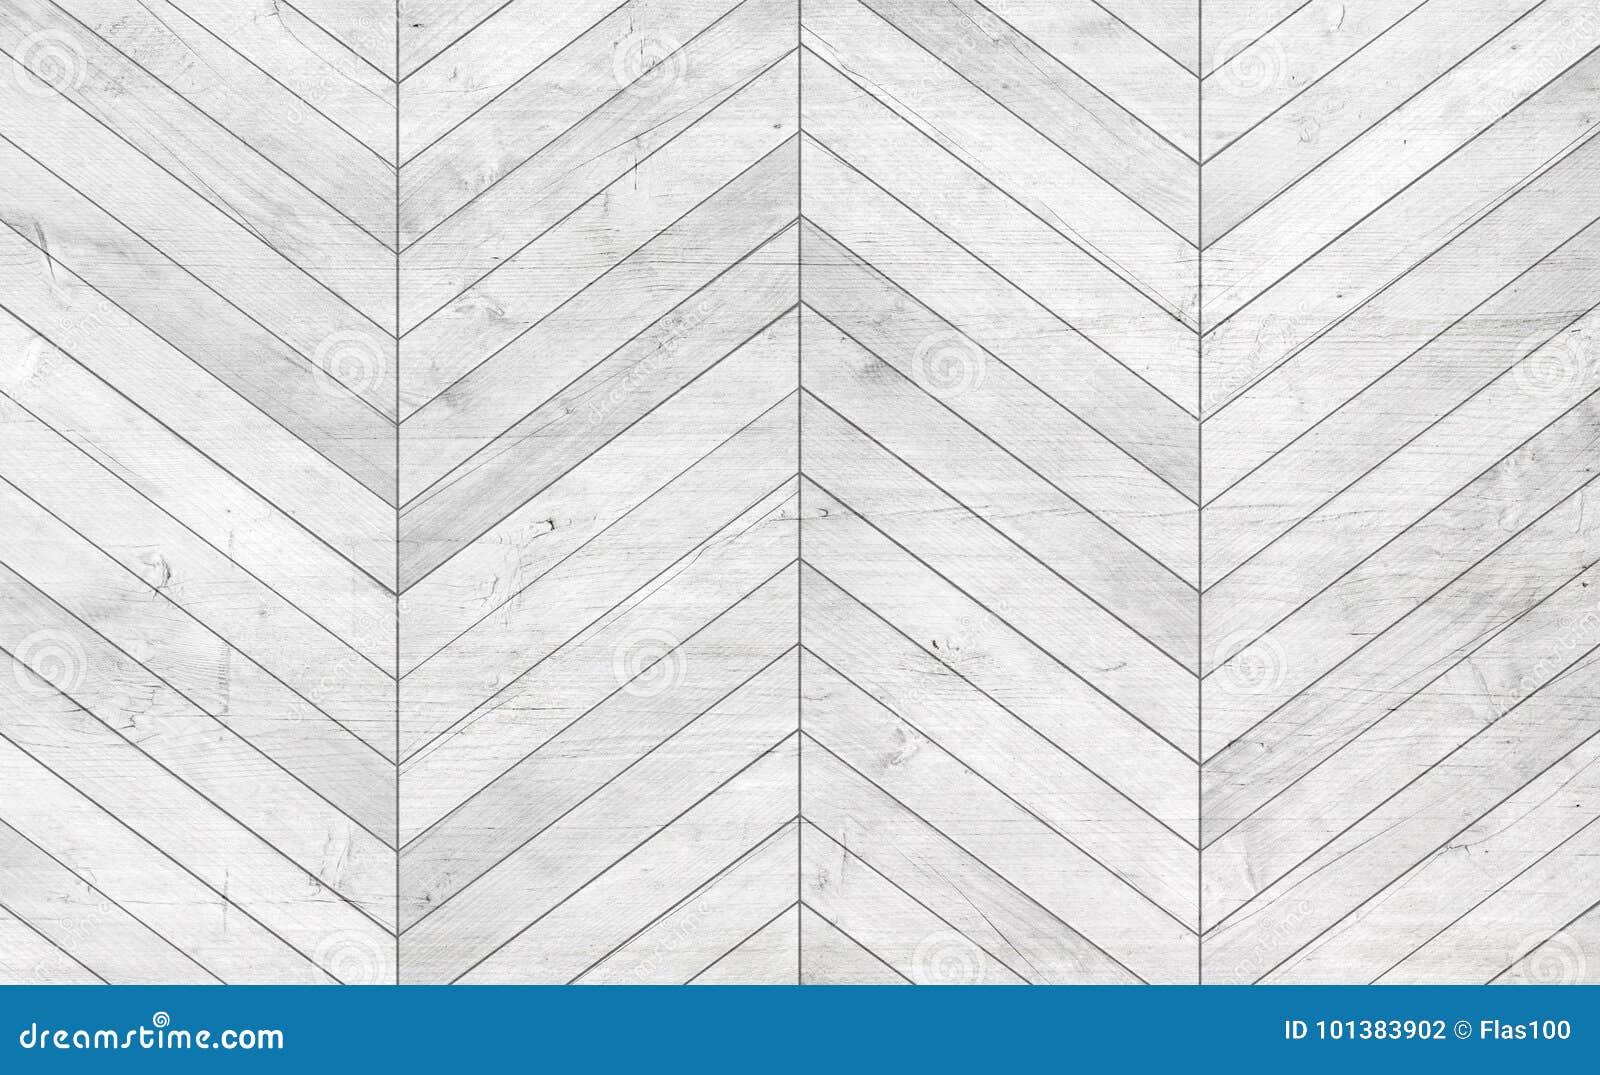 Natural Gray Wooden Parquet Herringbone Wood Texture